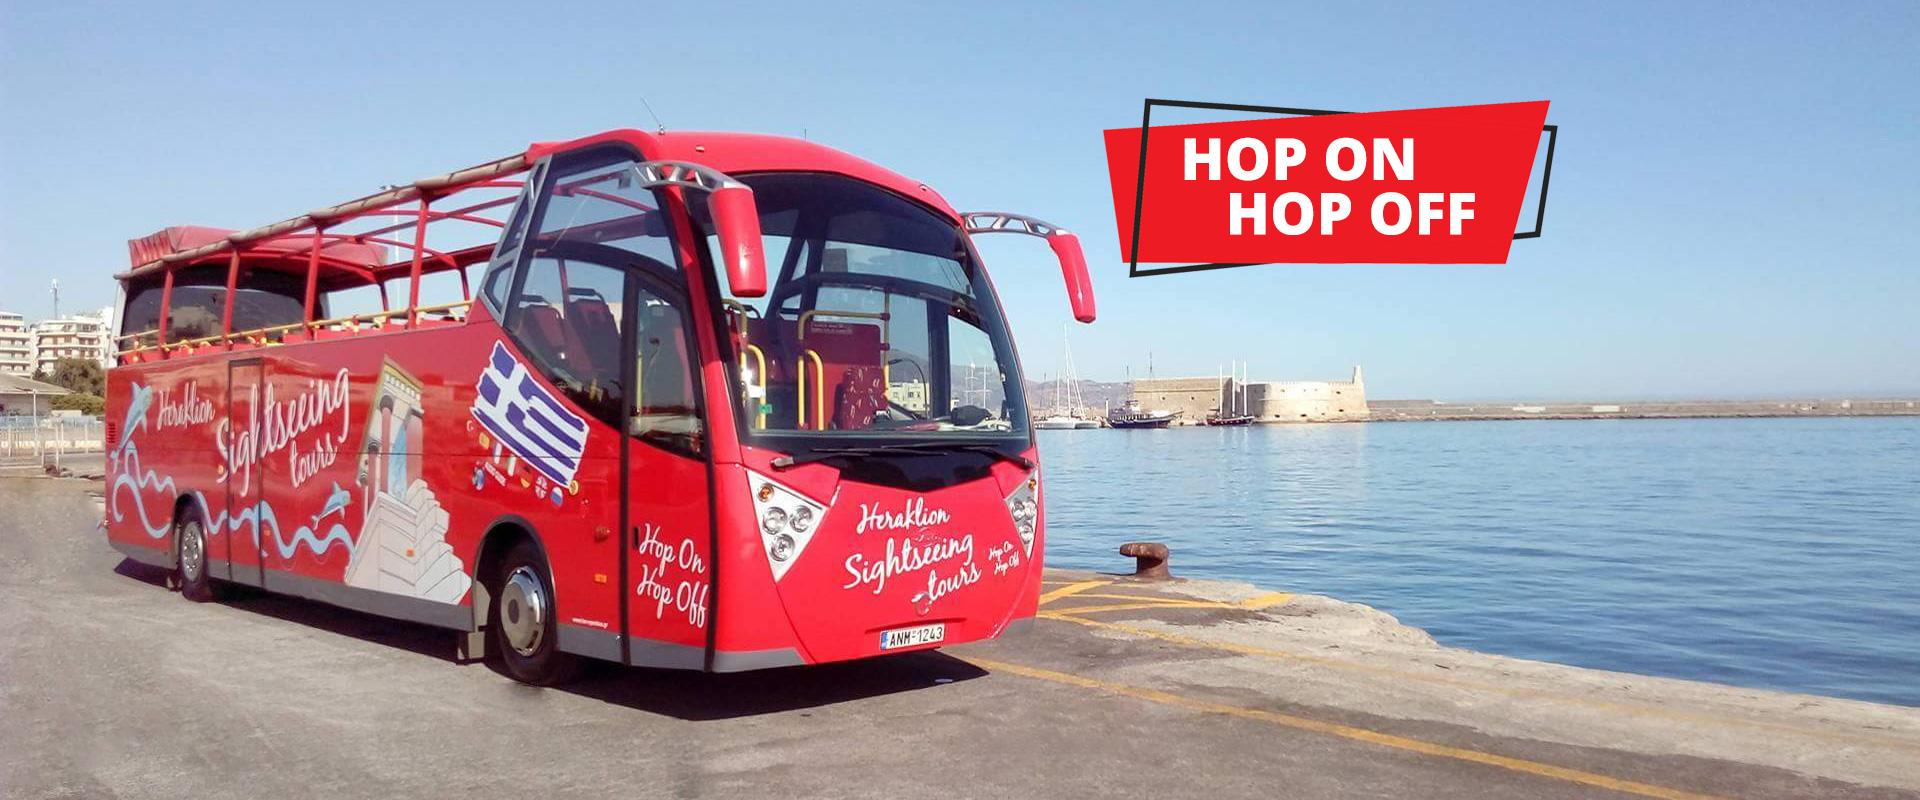 Heraklion Sightseeing Tour Open Bus